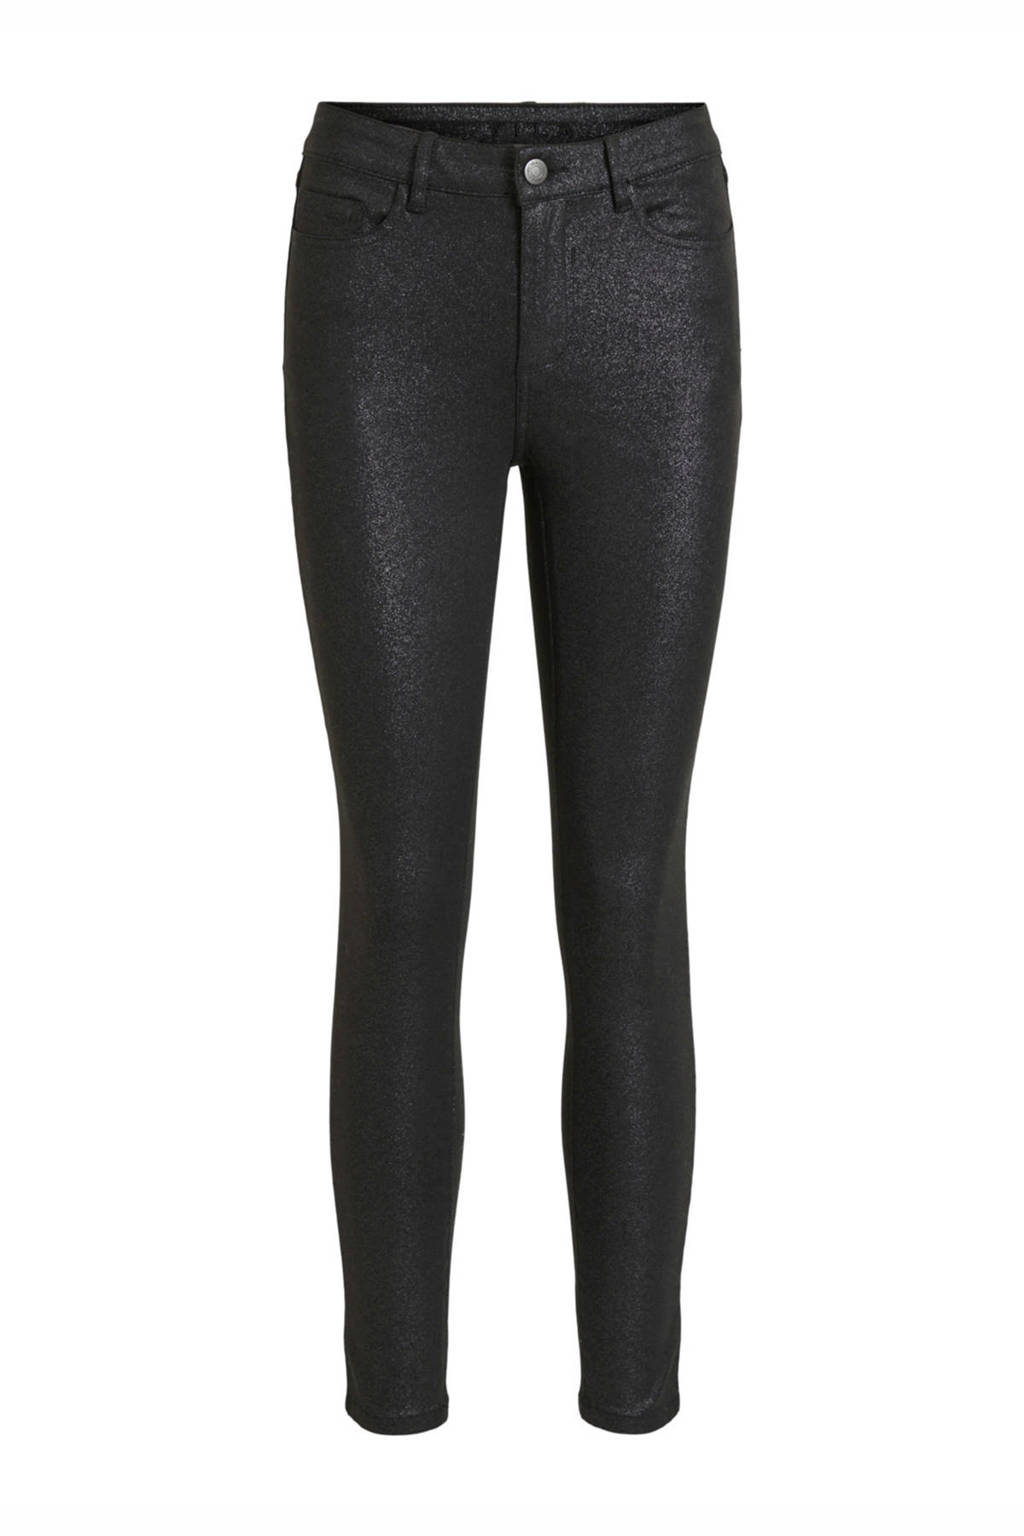 VILA skinny jeans zwart coating VISHINNY black, Zwart